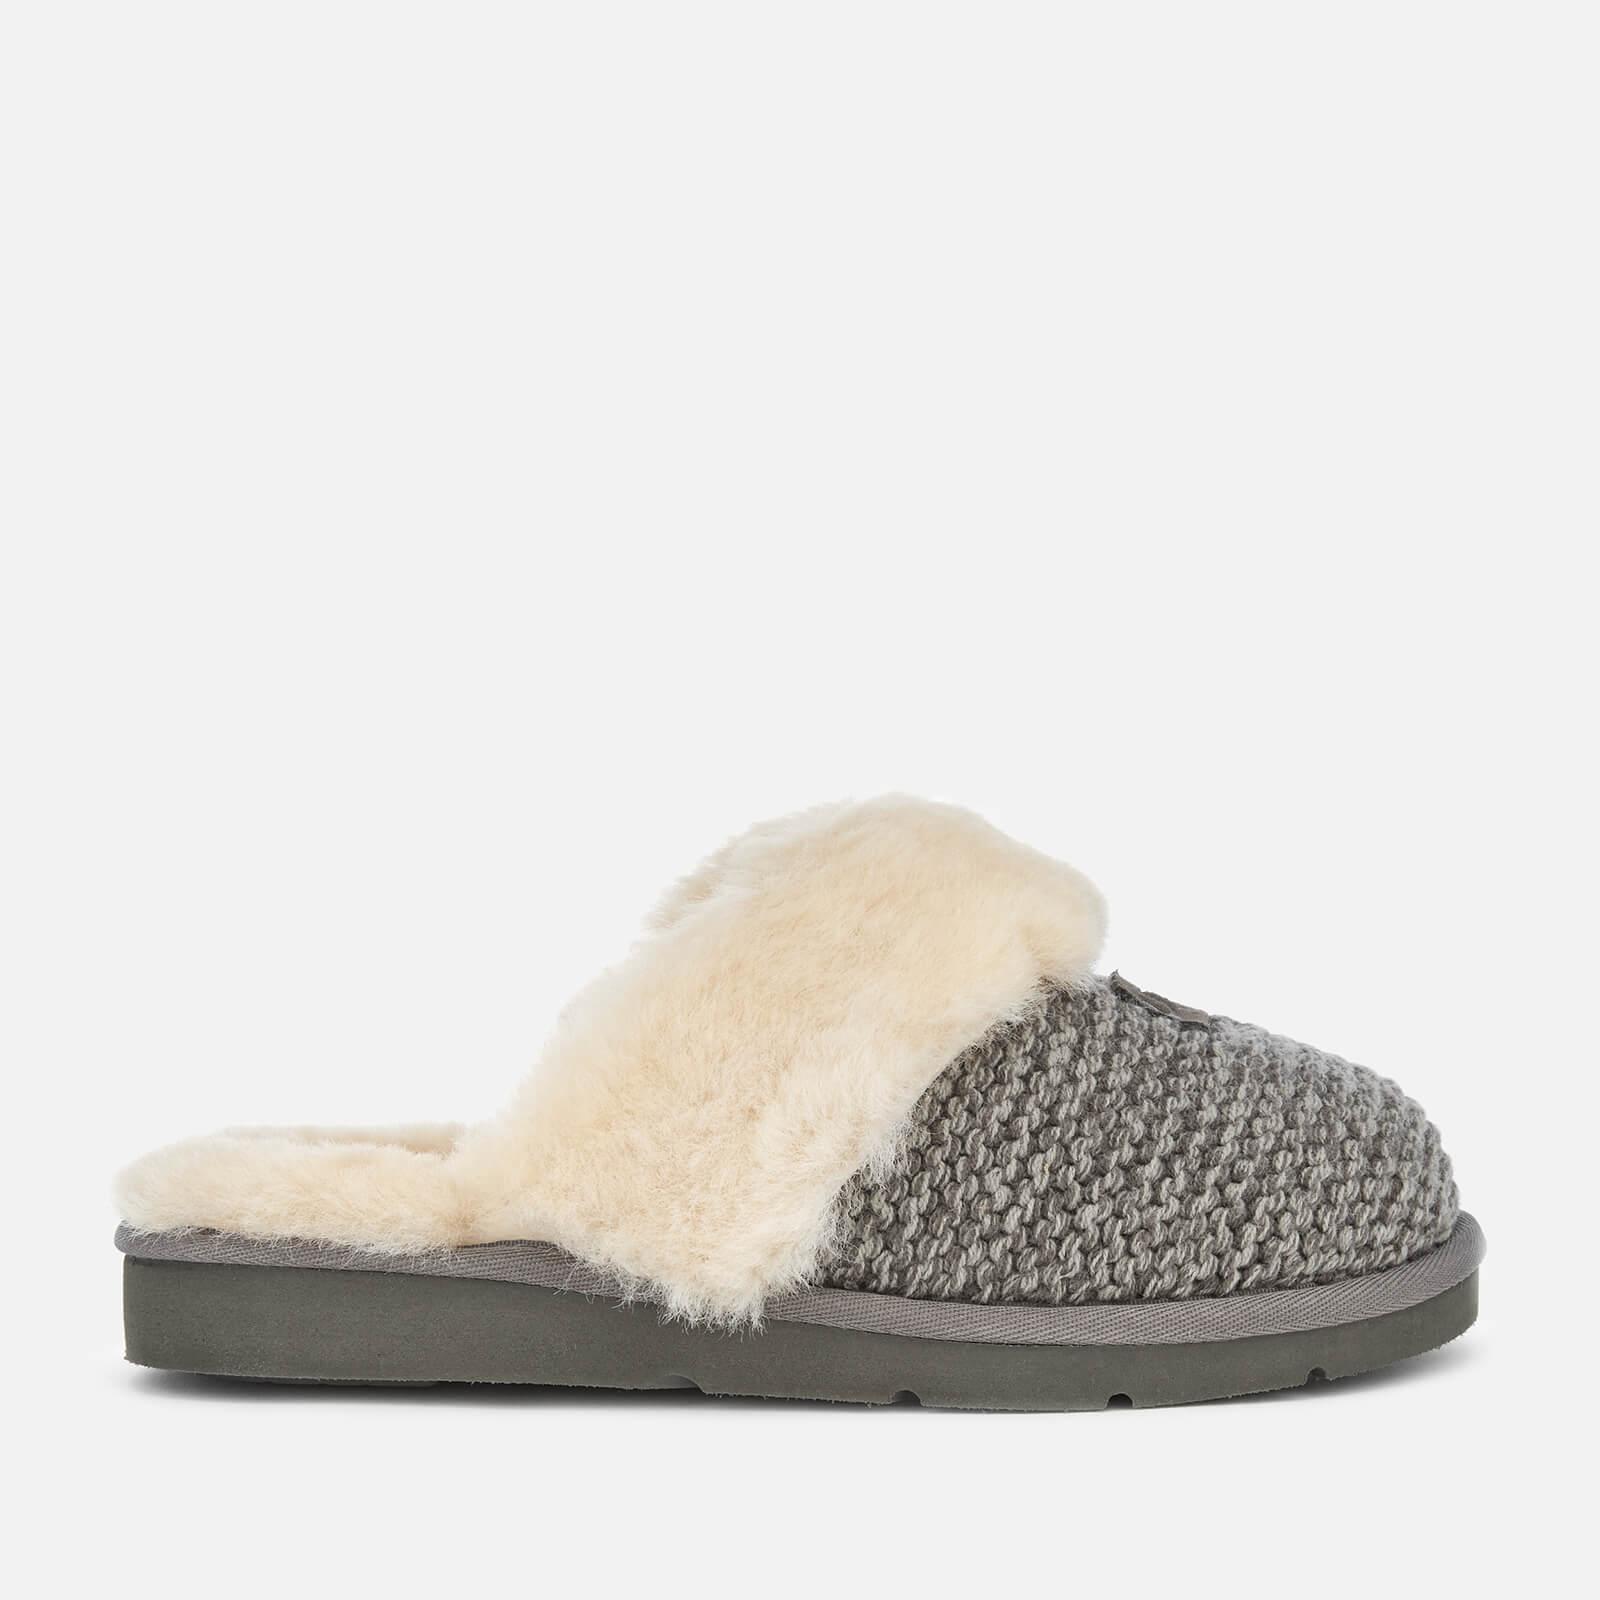 0702cbb5171 UGG Women s Cozy Knit Slippers - Charcoal Womens Footwear